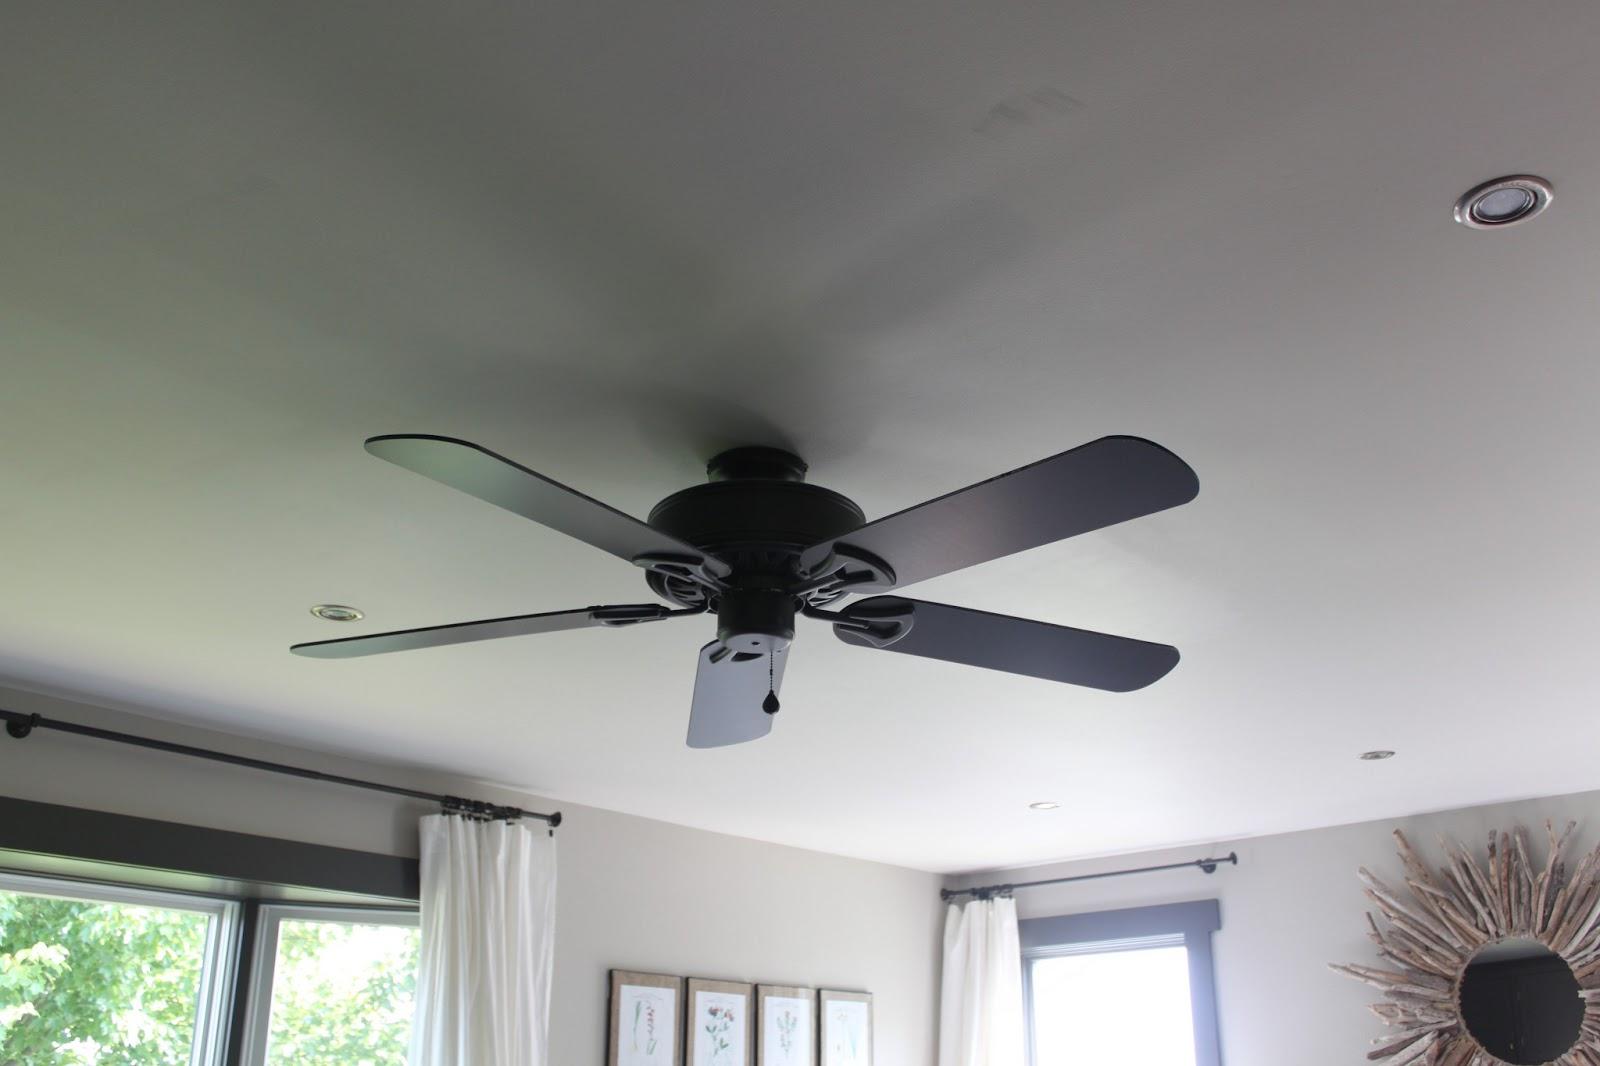 Boys bedroom ceiling fans 28 images ninja turtle Boys bedroom ceiling fans